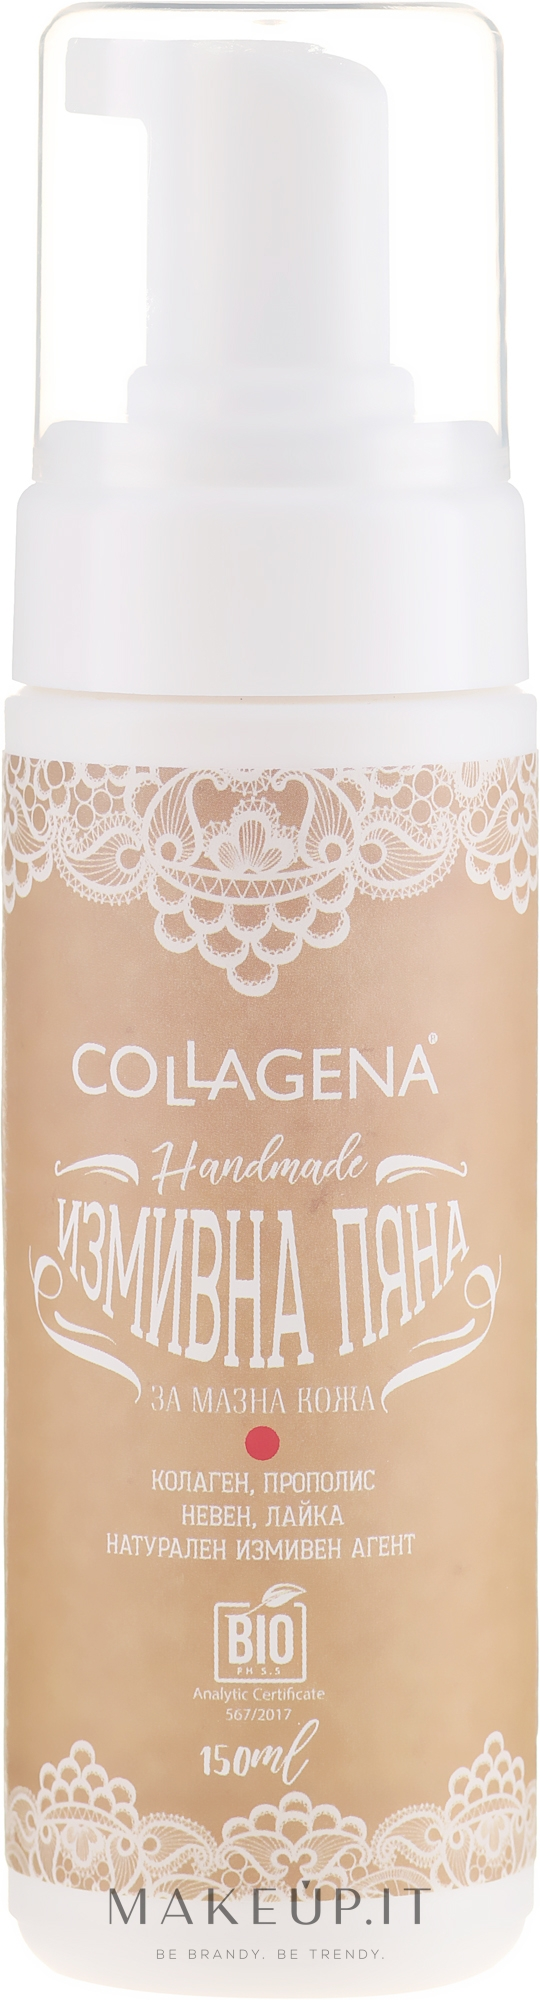 Schiuma per pelli grasse - Collagena Handmade Wash Foam For Oily Skin — foto 150 ml